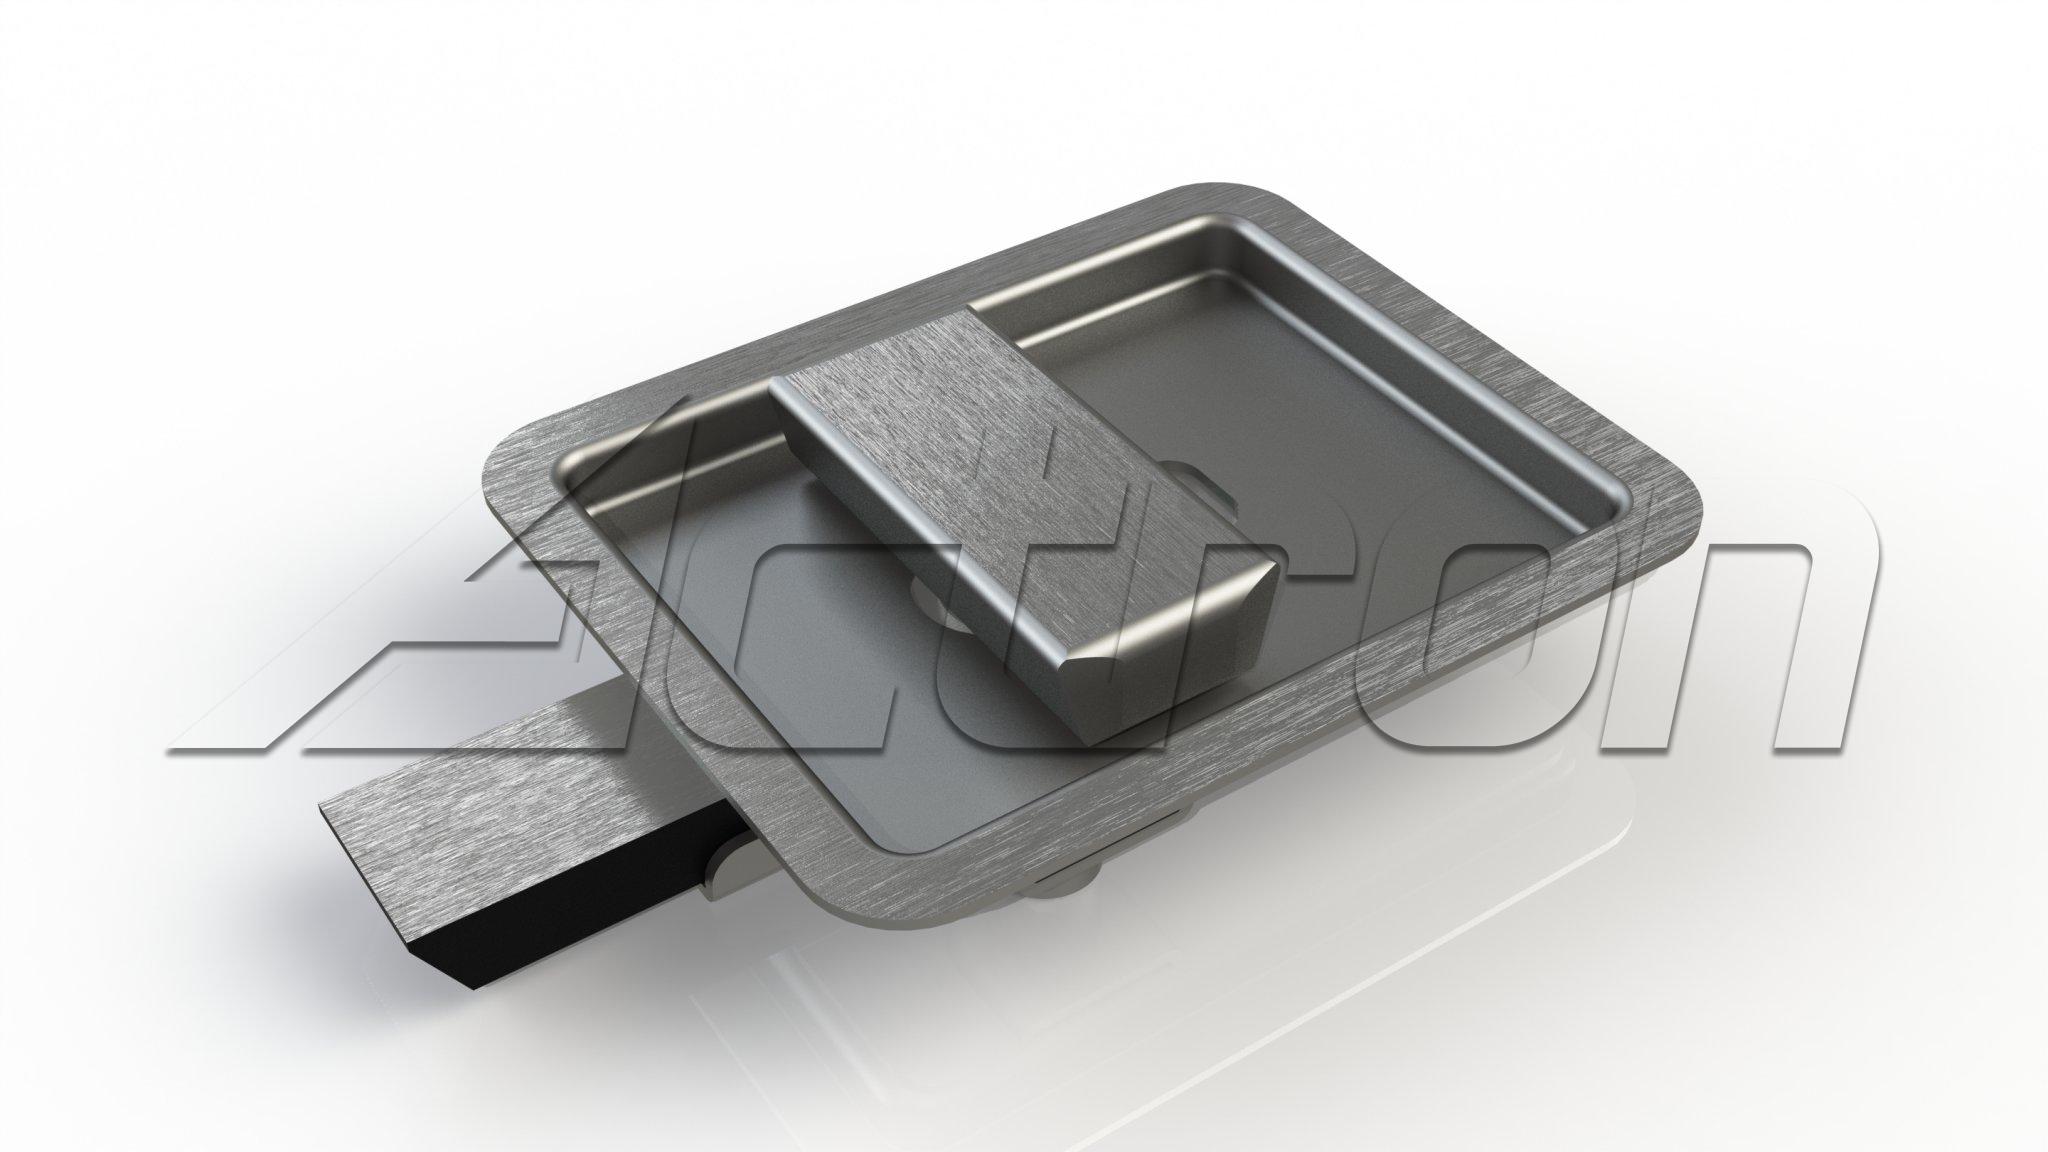 latchlock-assy-8211-sliding-4496-a27076.jpg